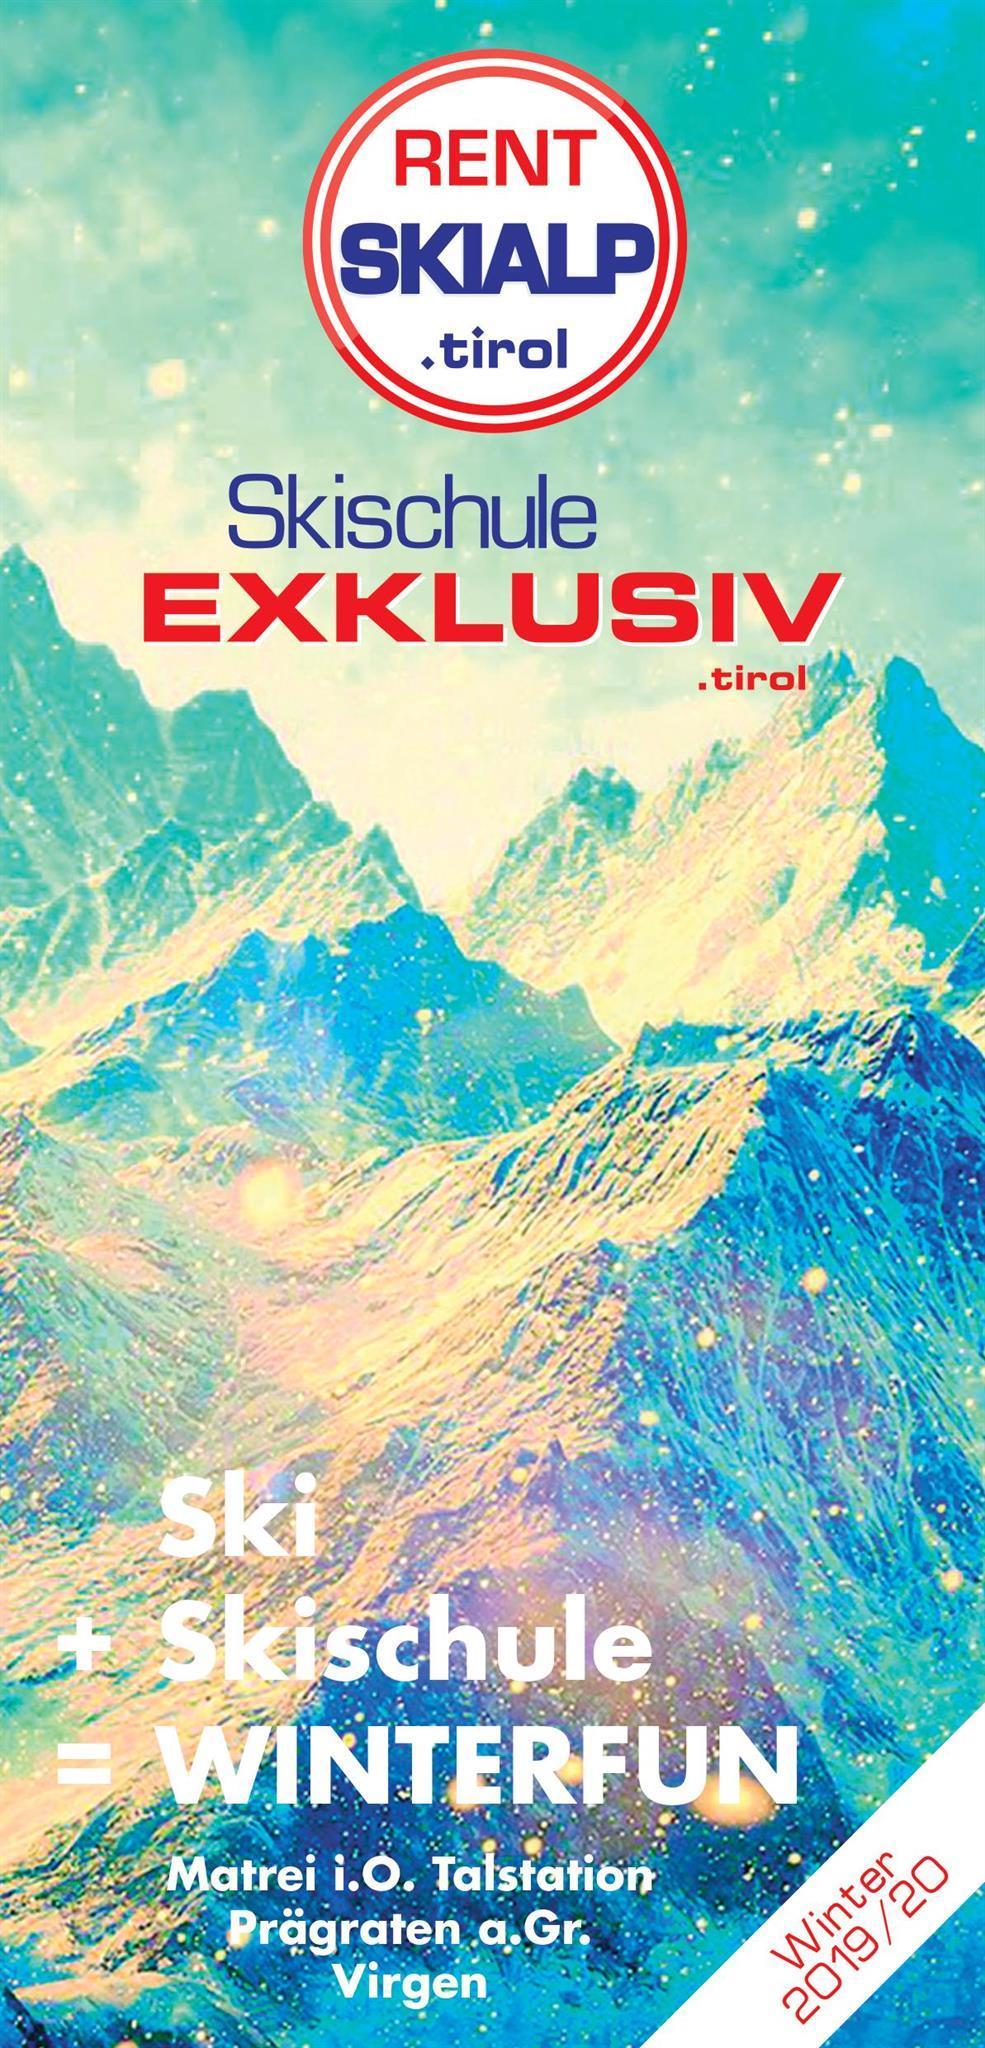 Skischule-Exklusiv.jpg